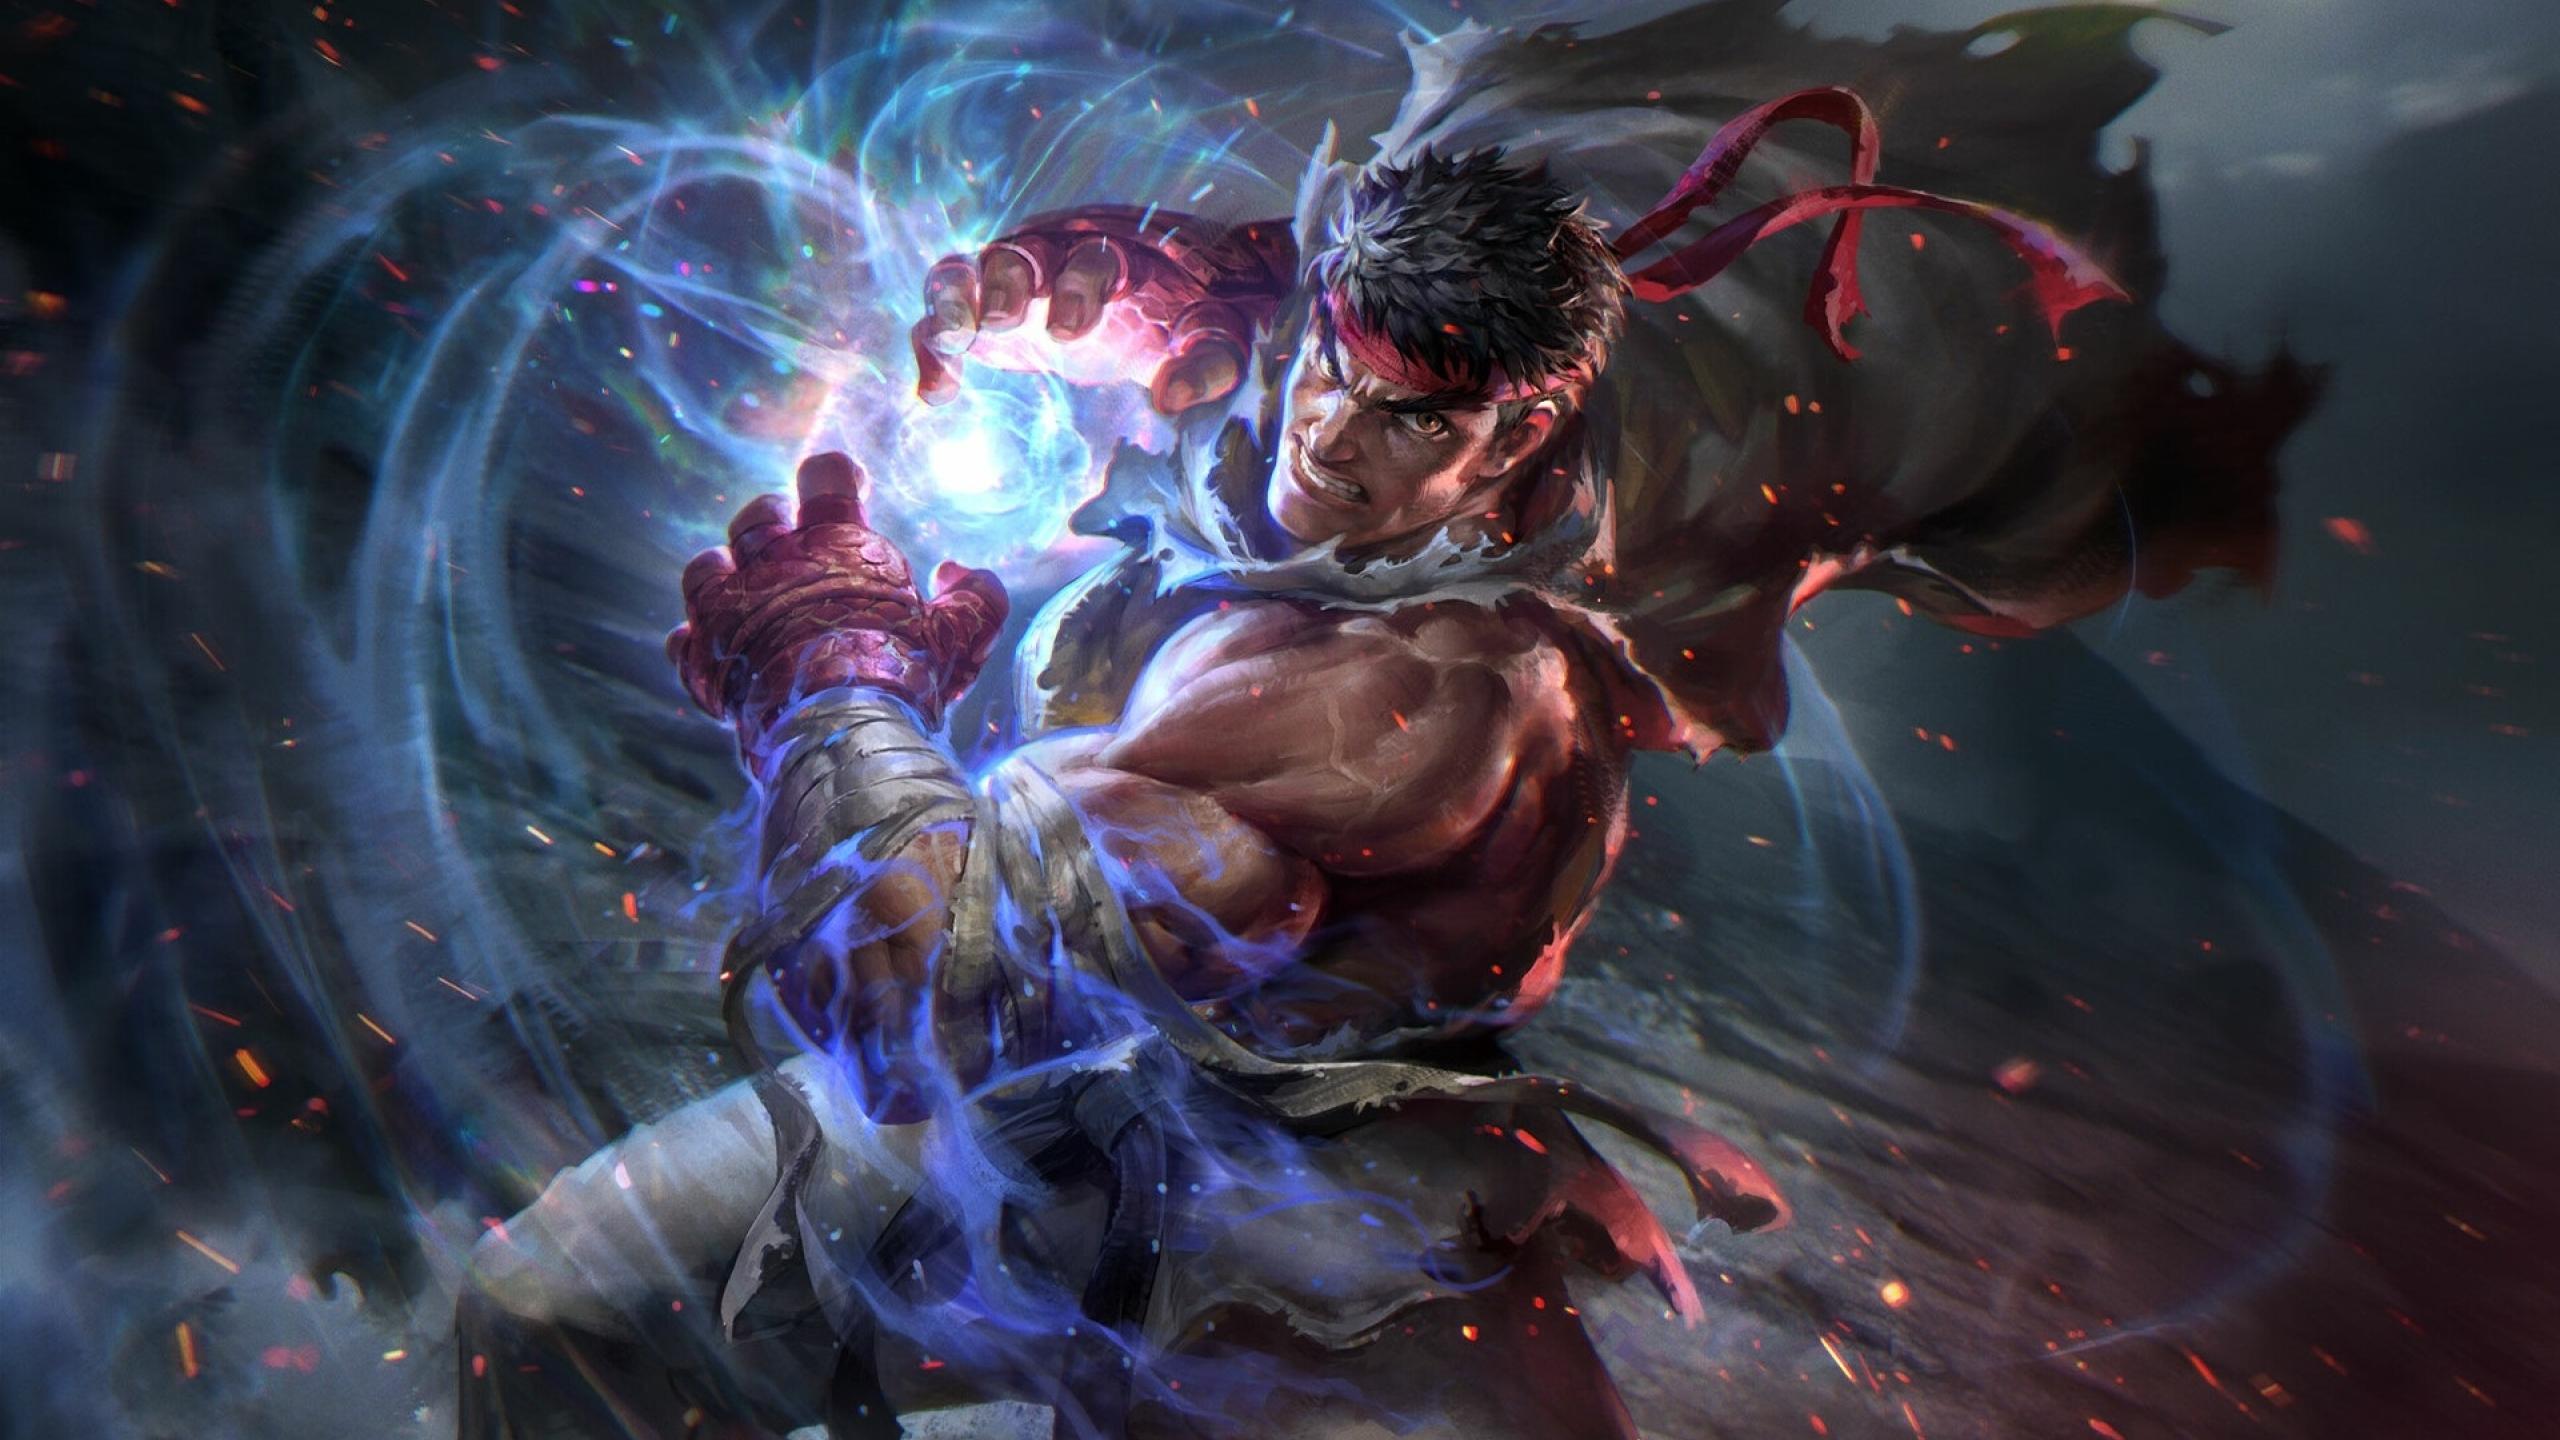 2560x1440 Ryu Street Fighter 1440P Resolution Wallpaper ...